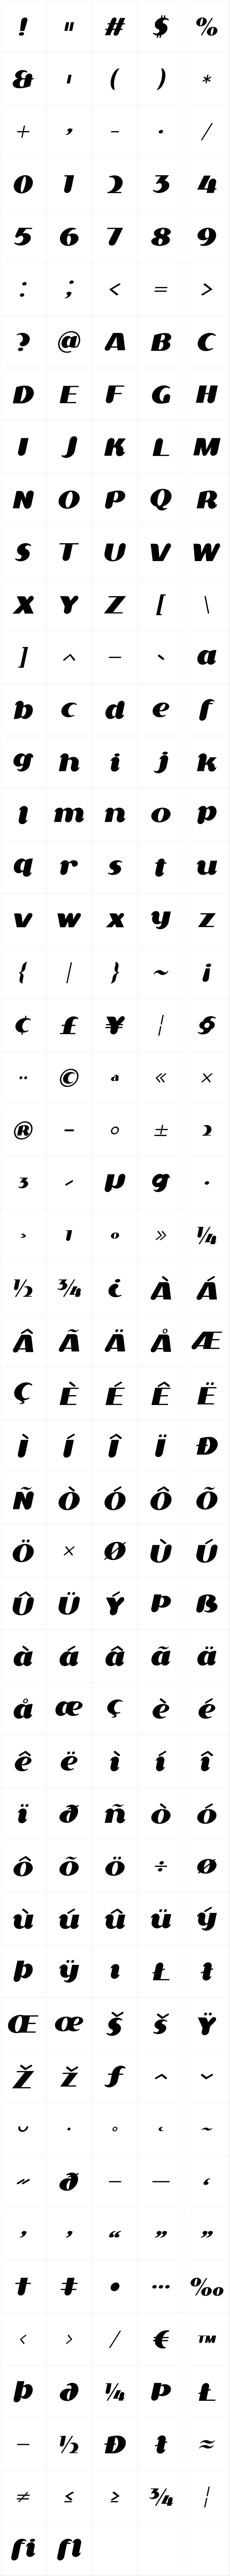 P22 Akebono Italic